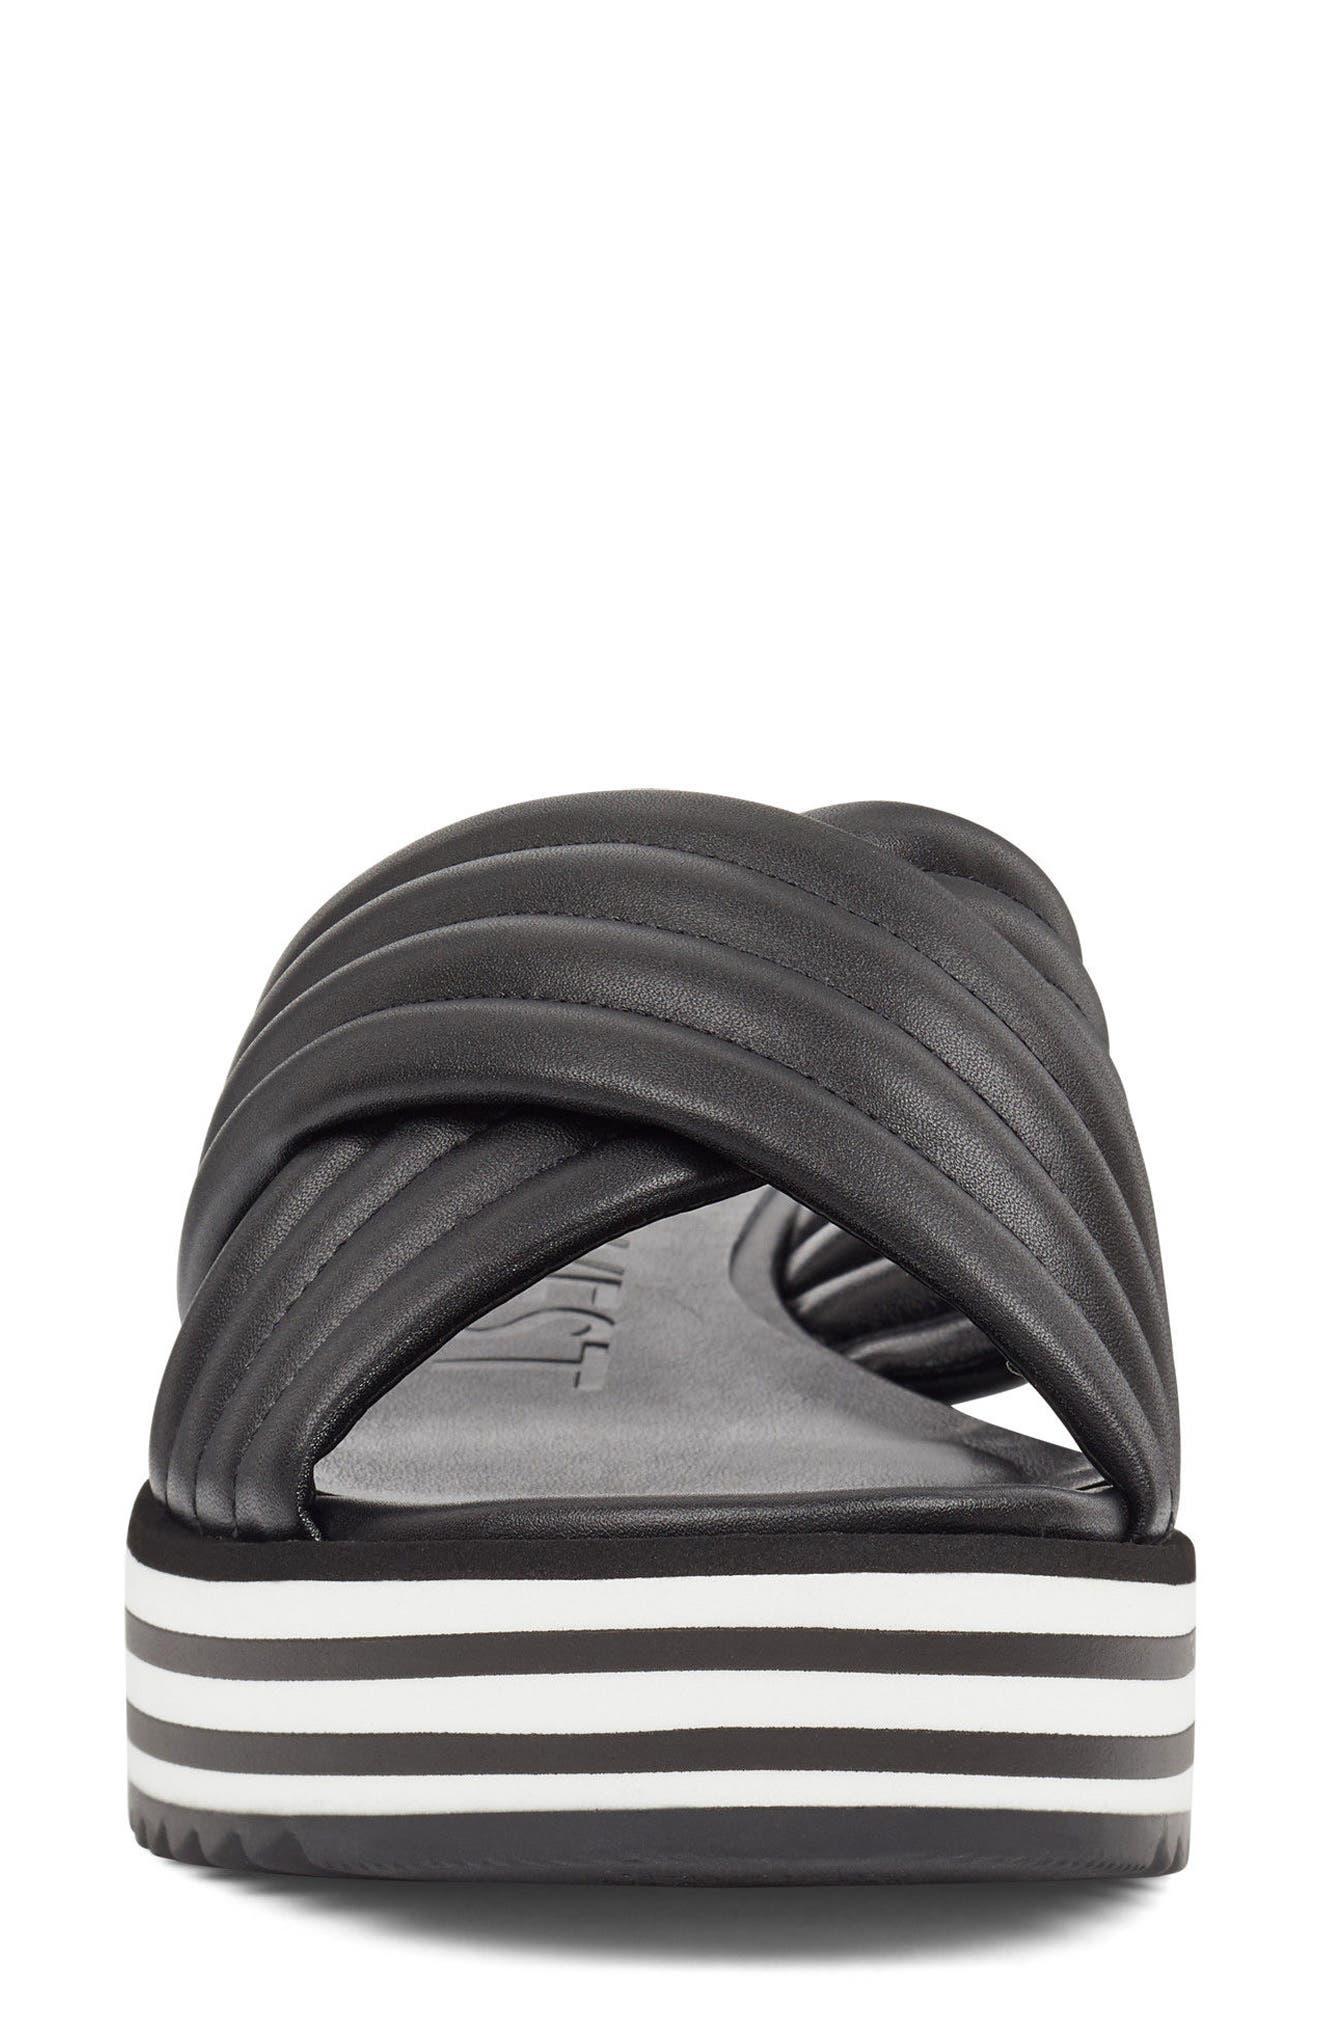 Zonita Platform Slide Sandal,                             Alternate thumbnail 4, color,                             001